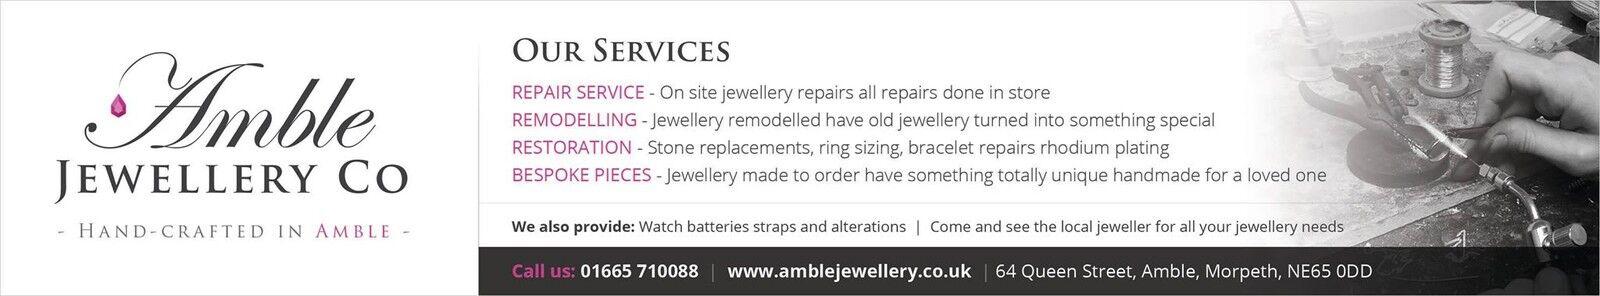 Amble Jewellery Co